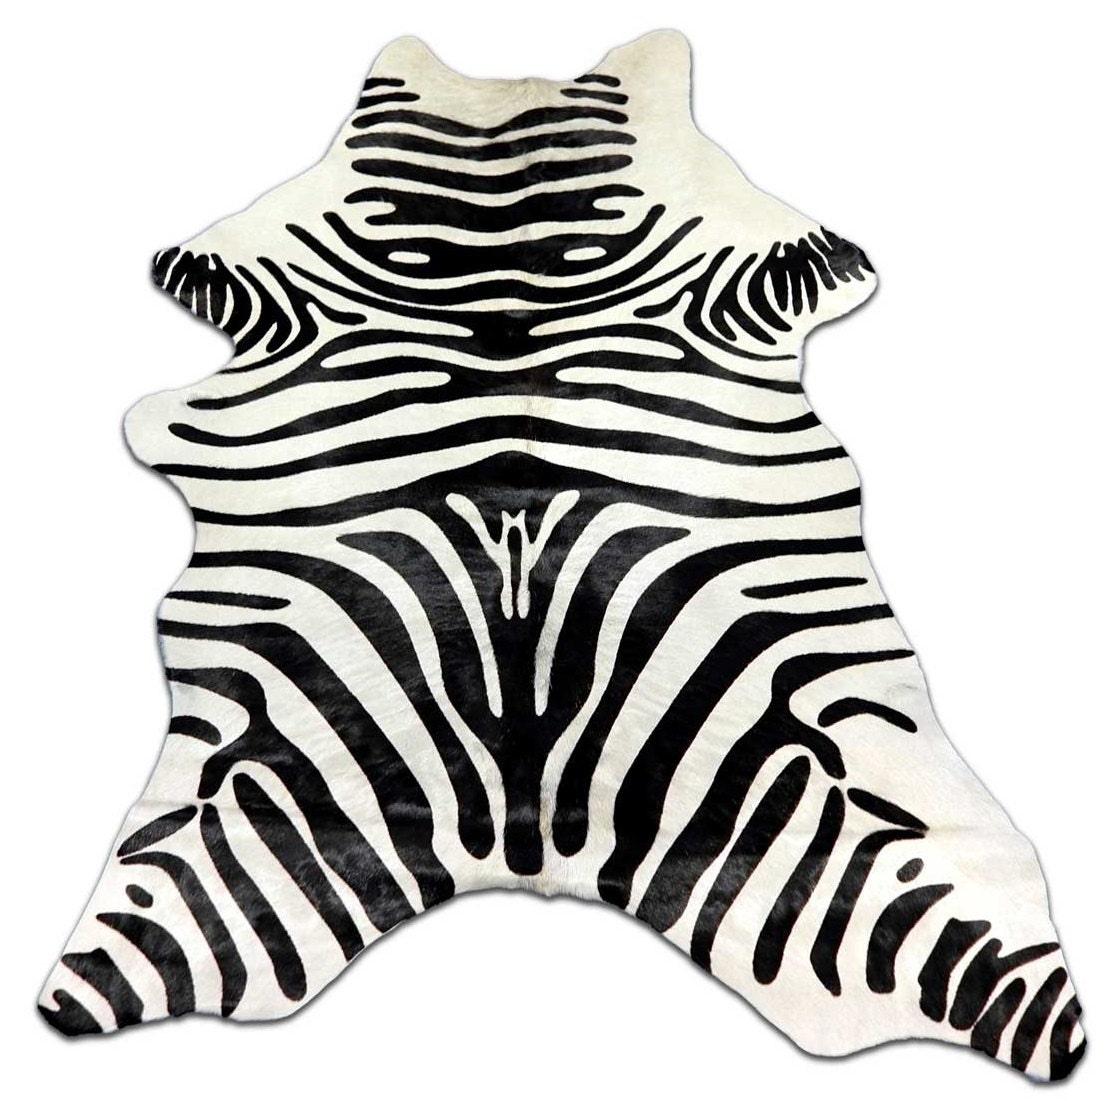 Zebra Cowhide Rug Mini Zebra Calfskin Approximate Size: